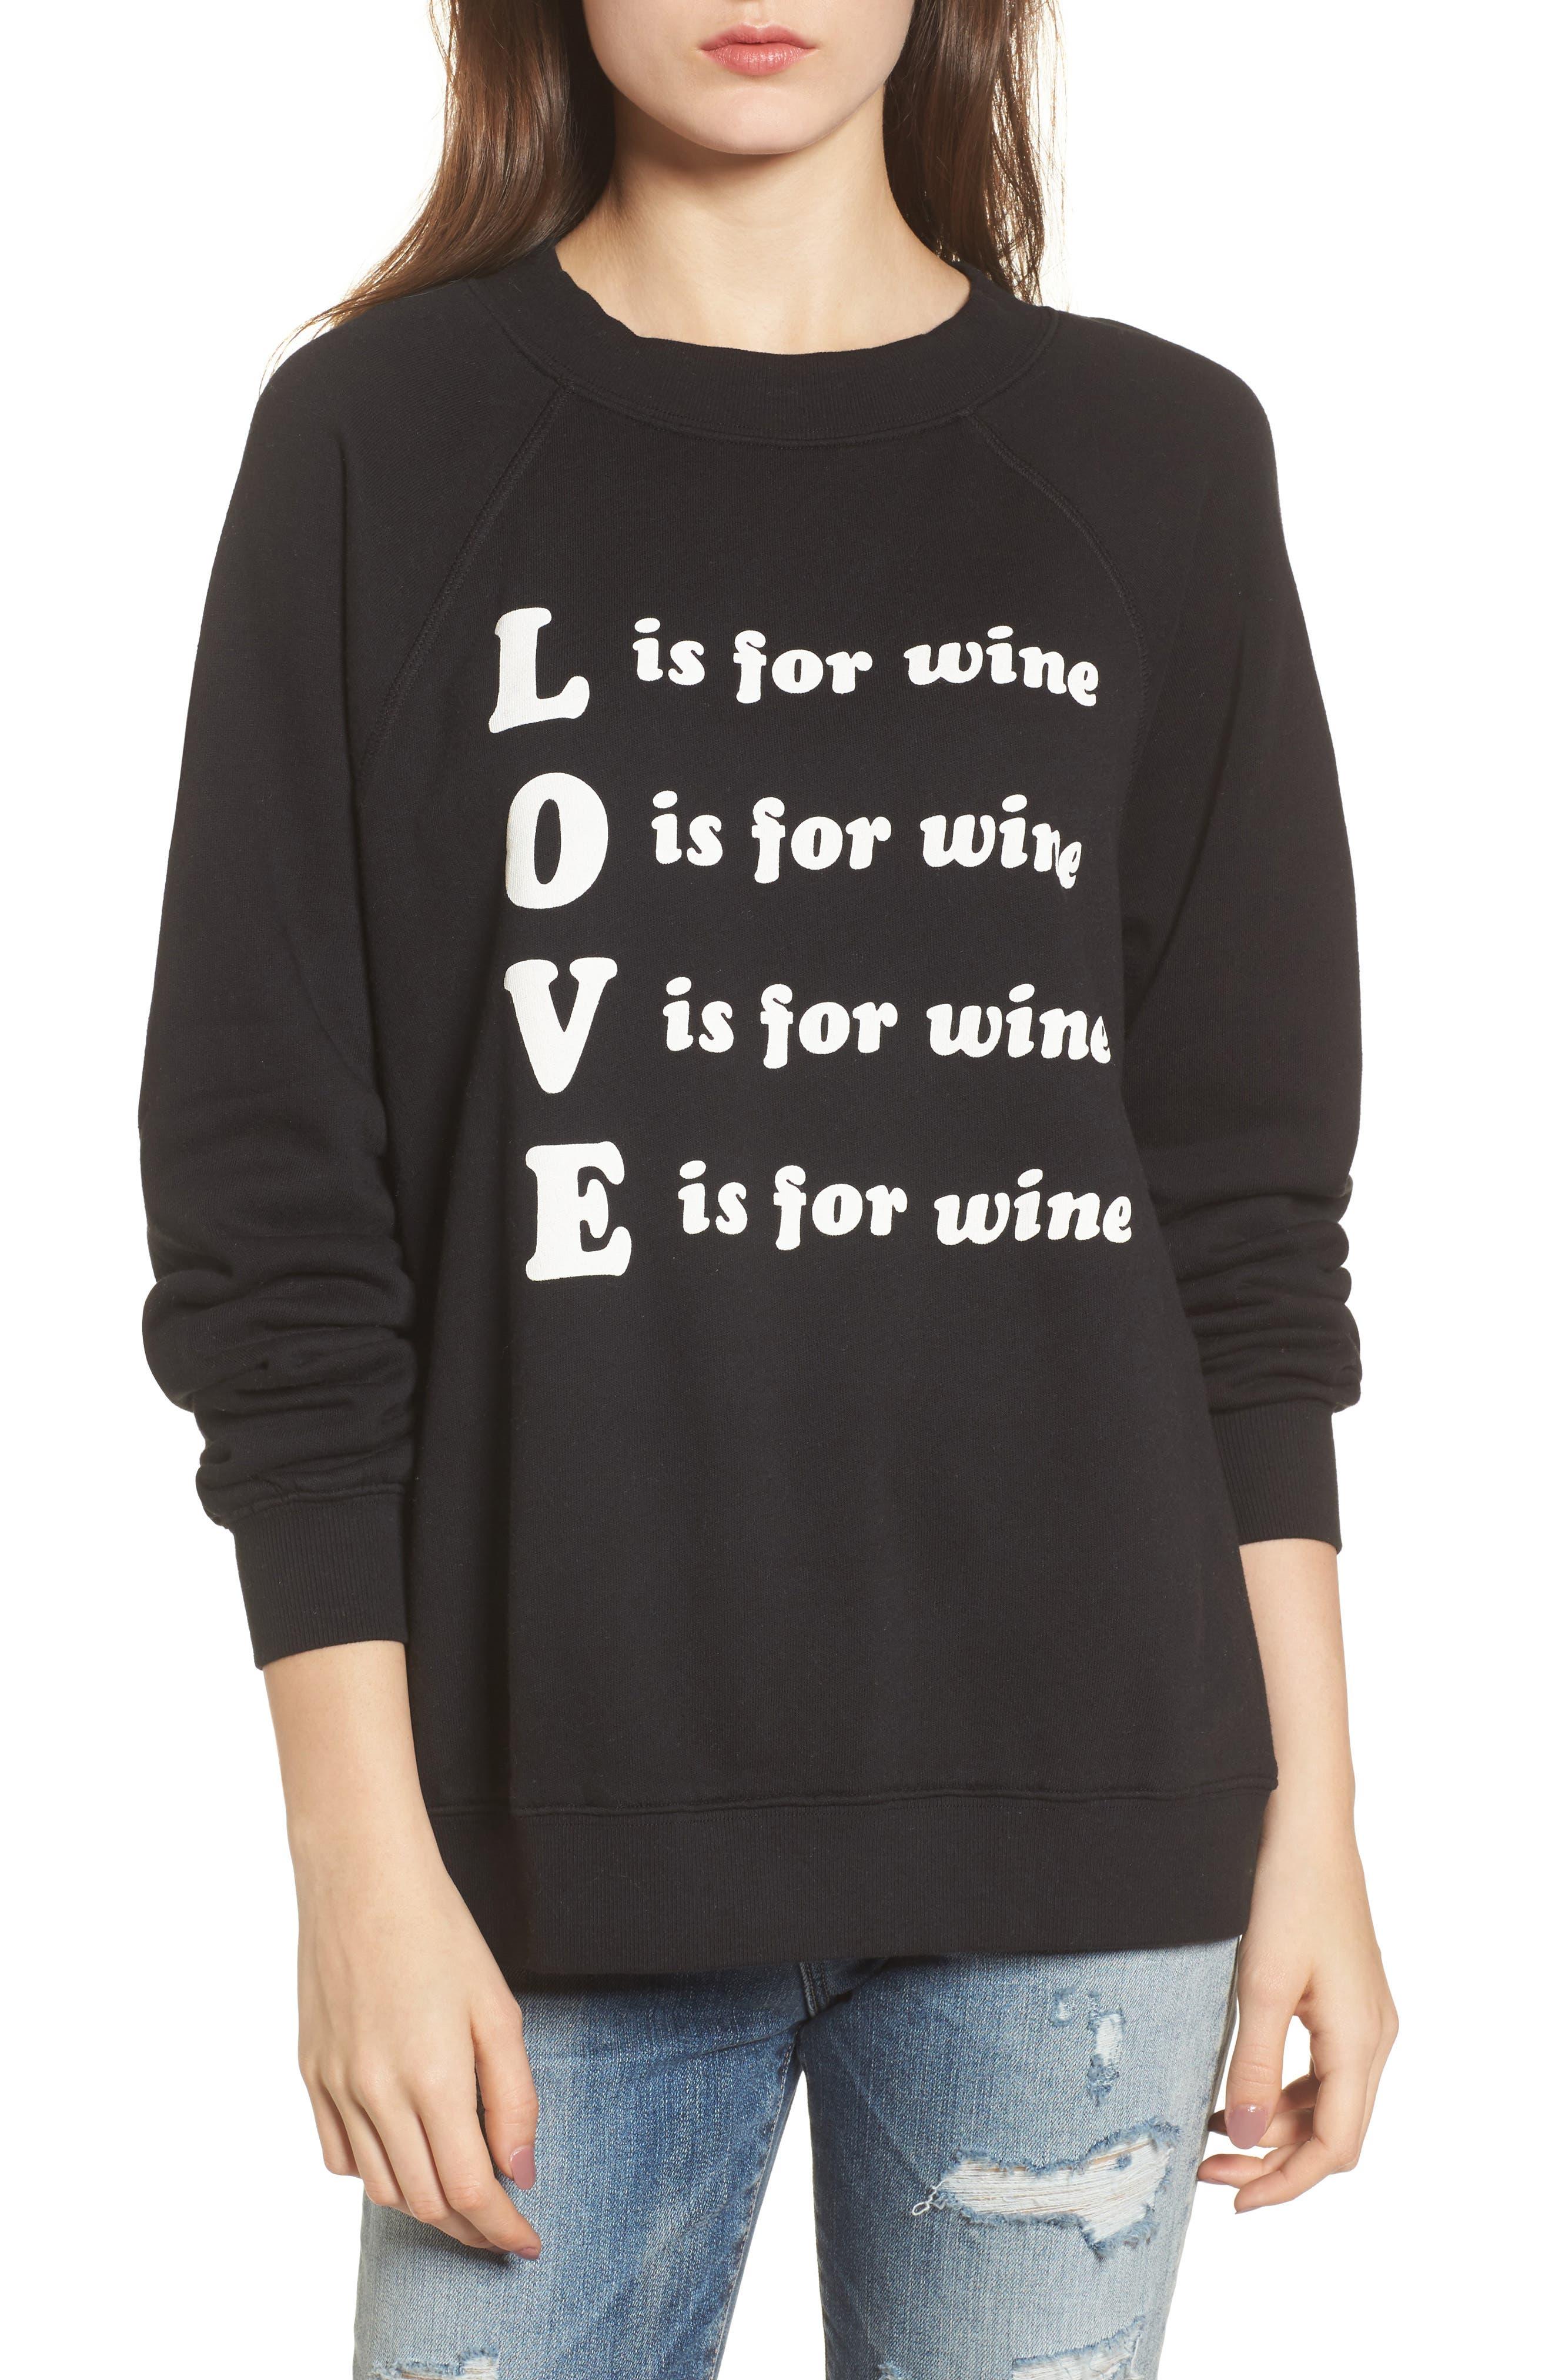 Wino - Sommers Sweatshirt,                             Main thumbnail 1, color,                             001